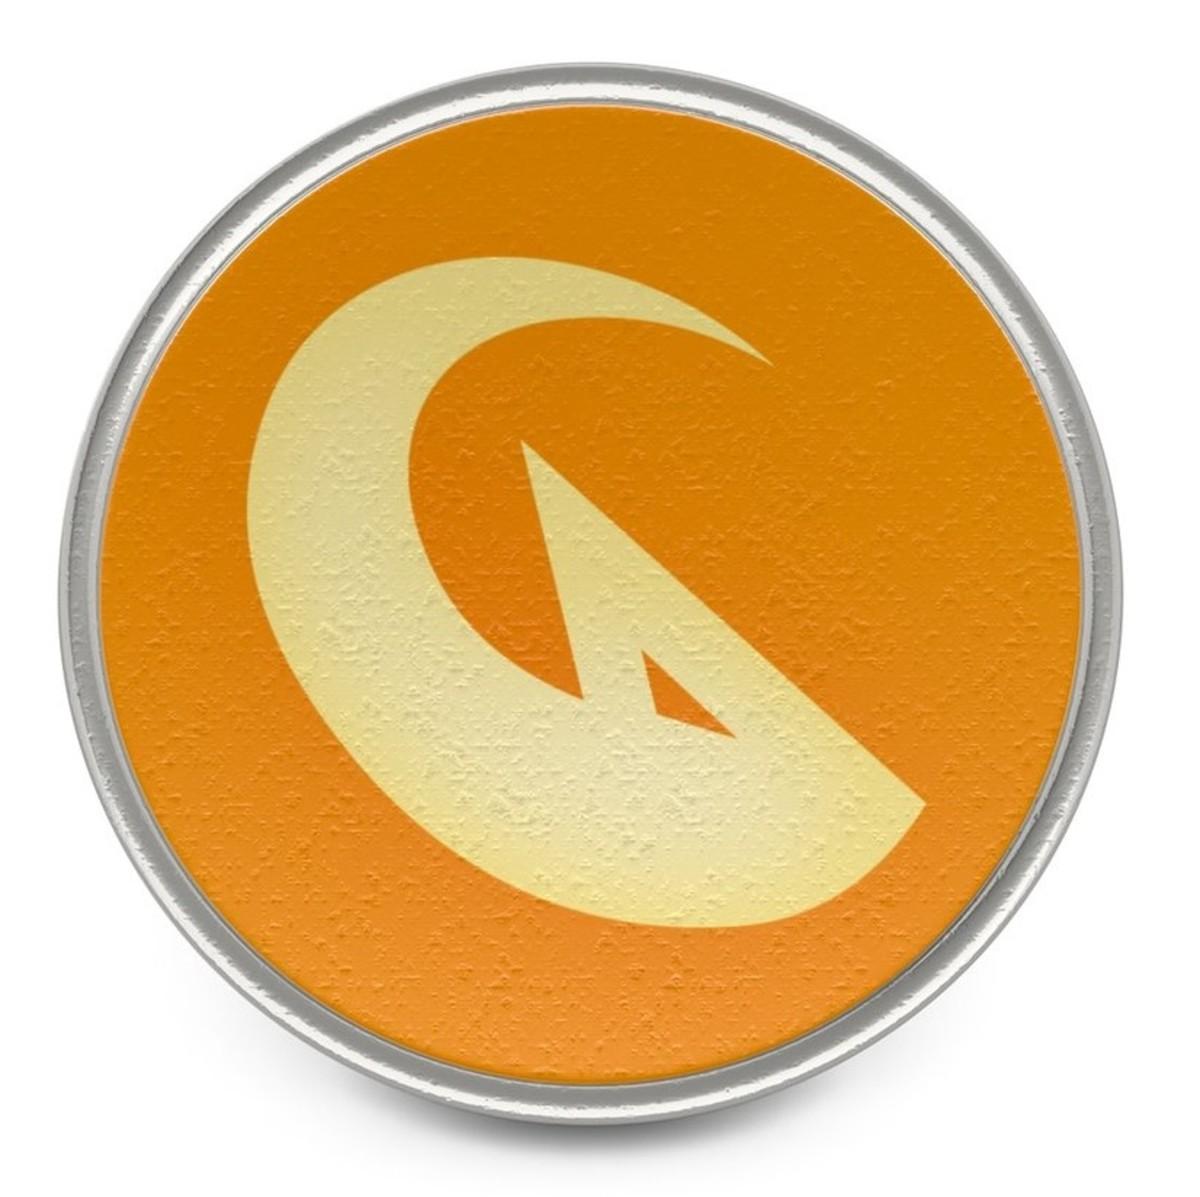 Dragon Pokémon logo